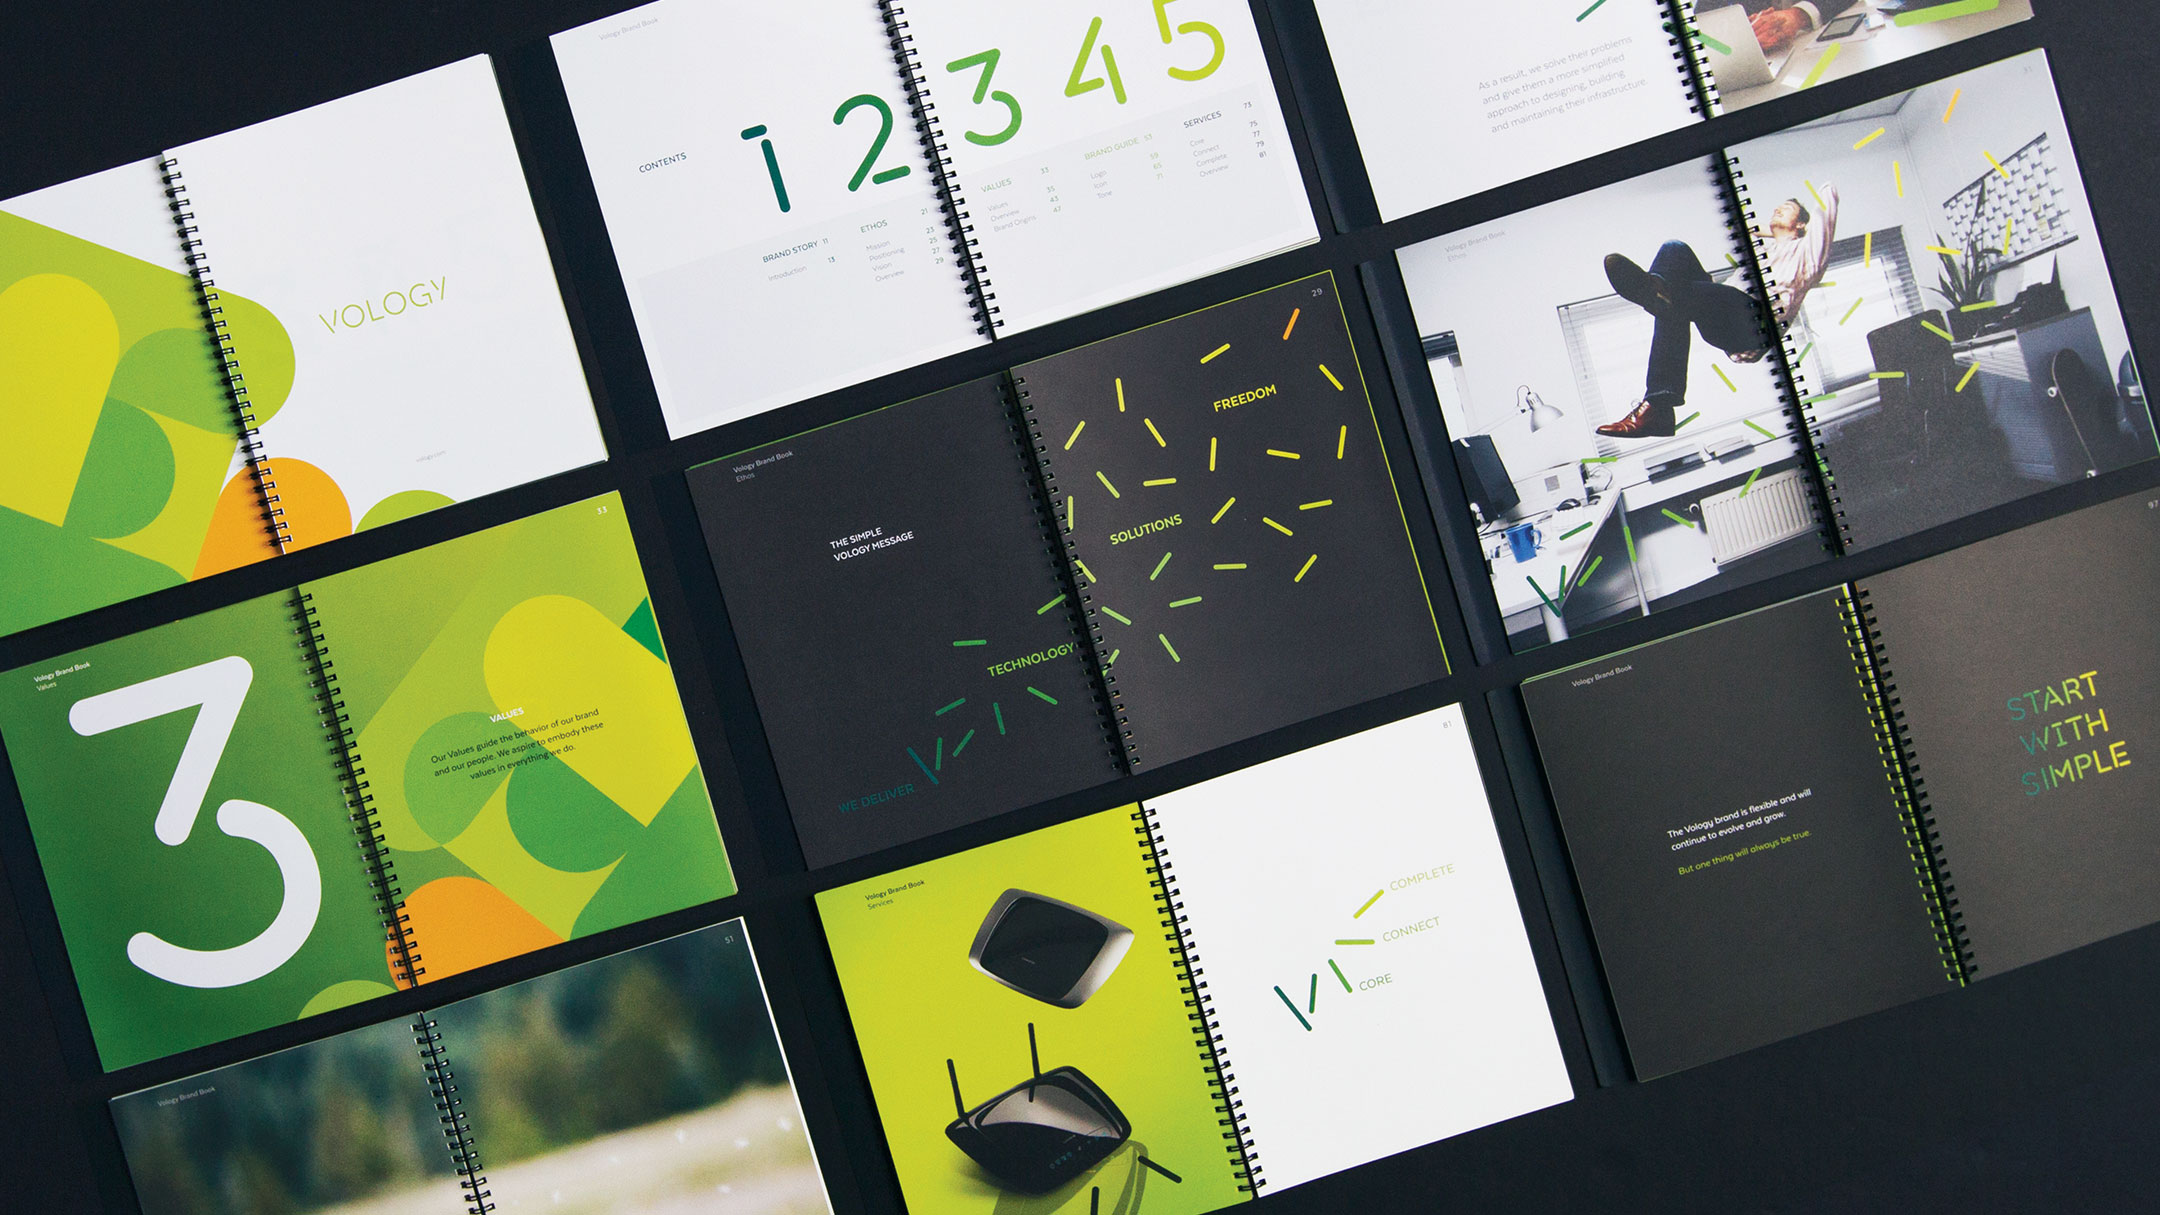 Vology brand book spreads